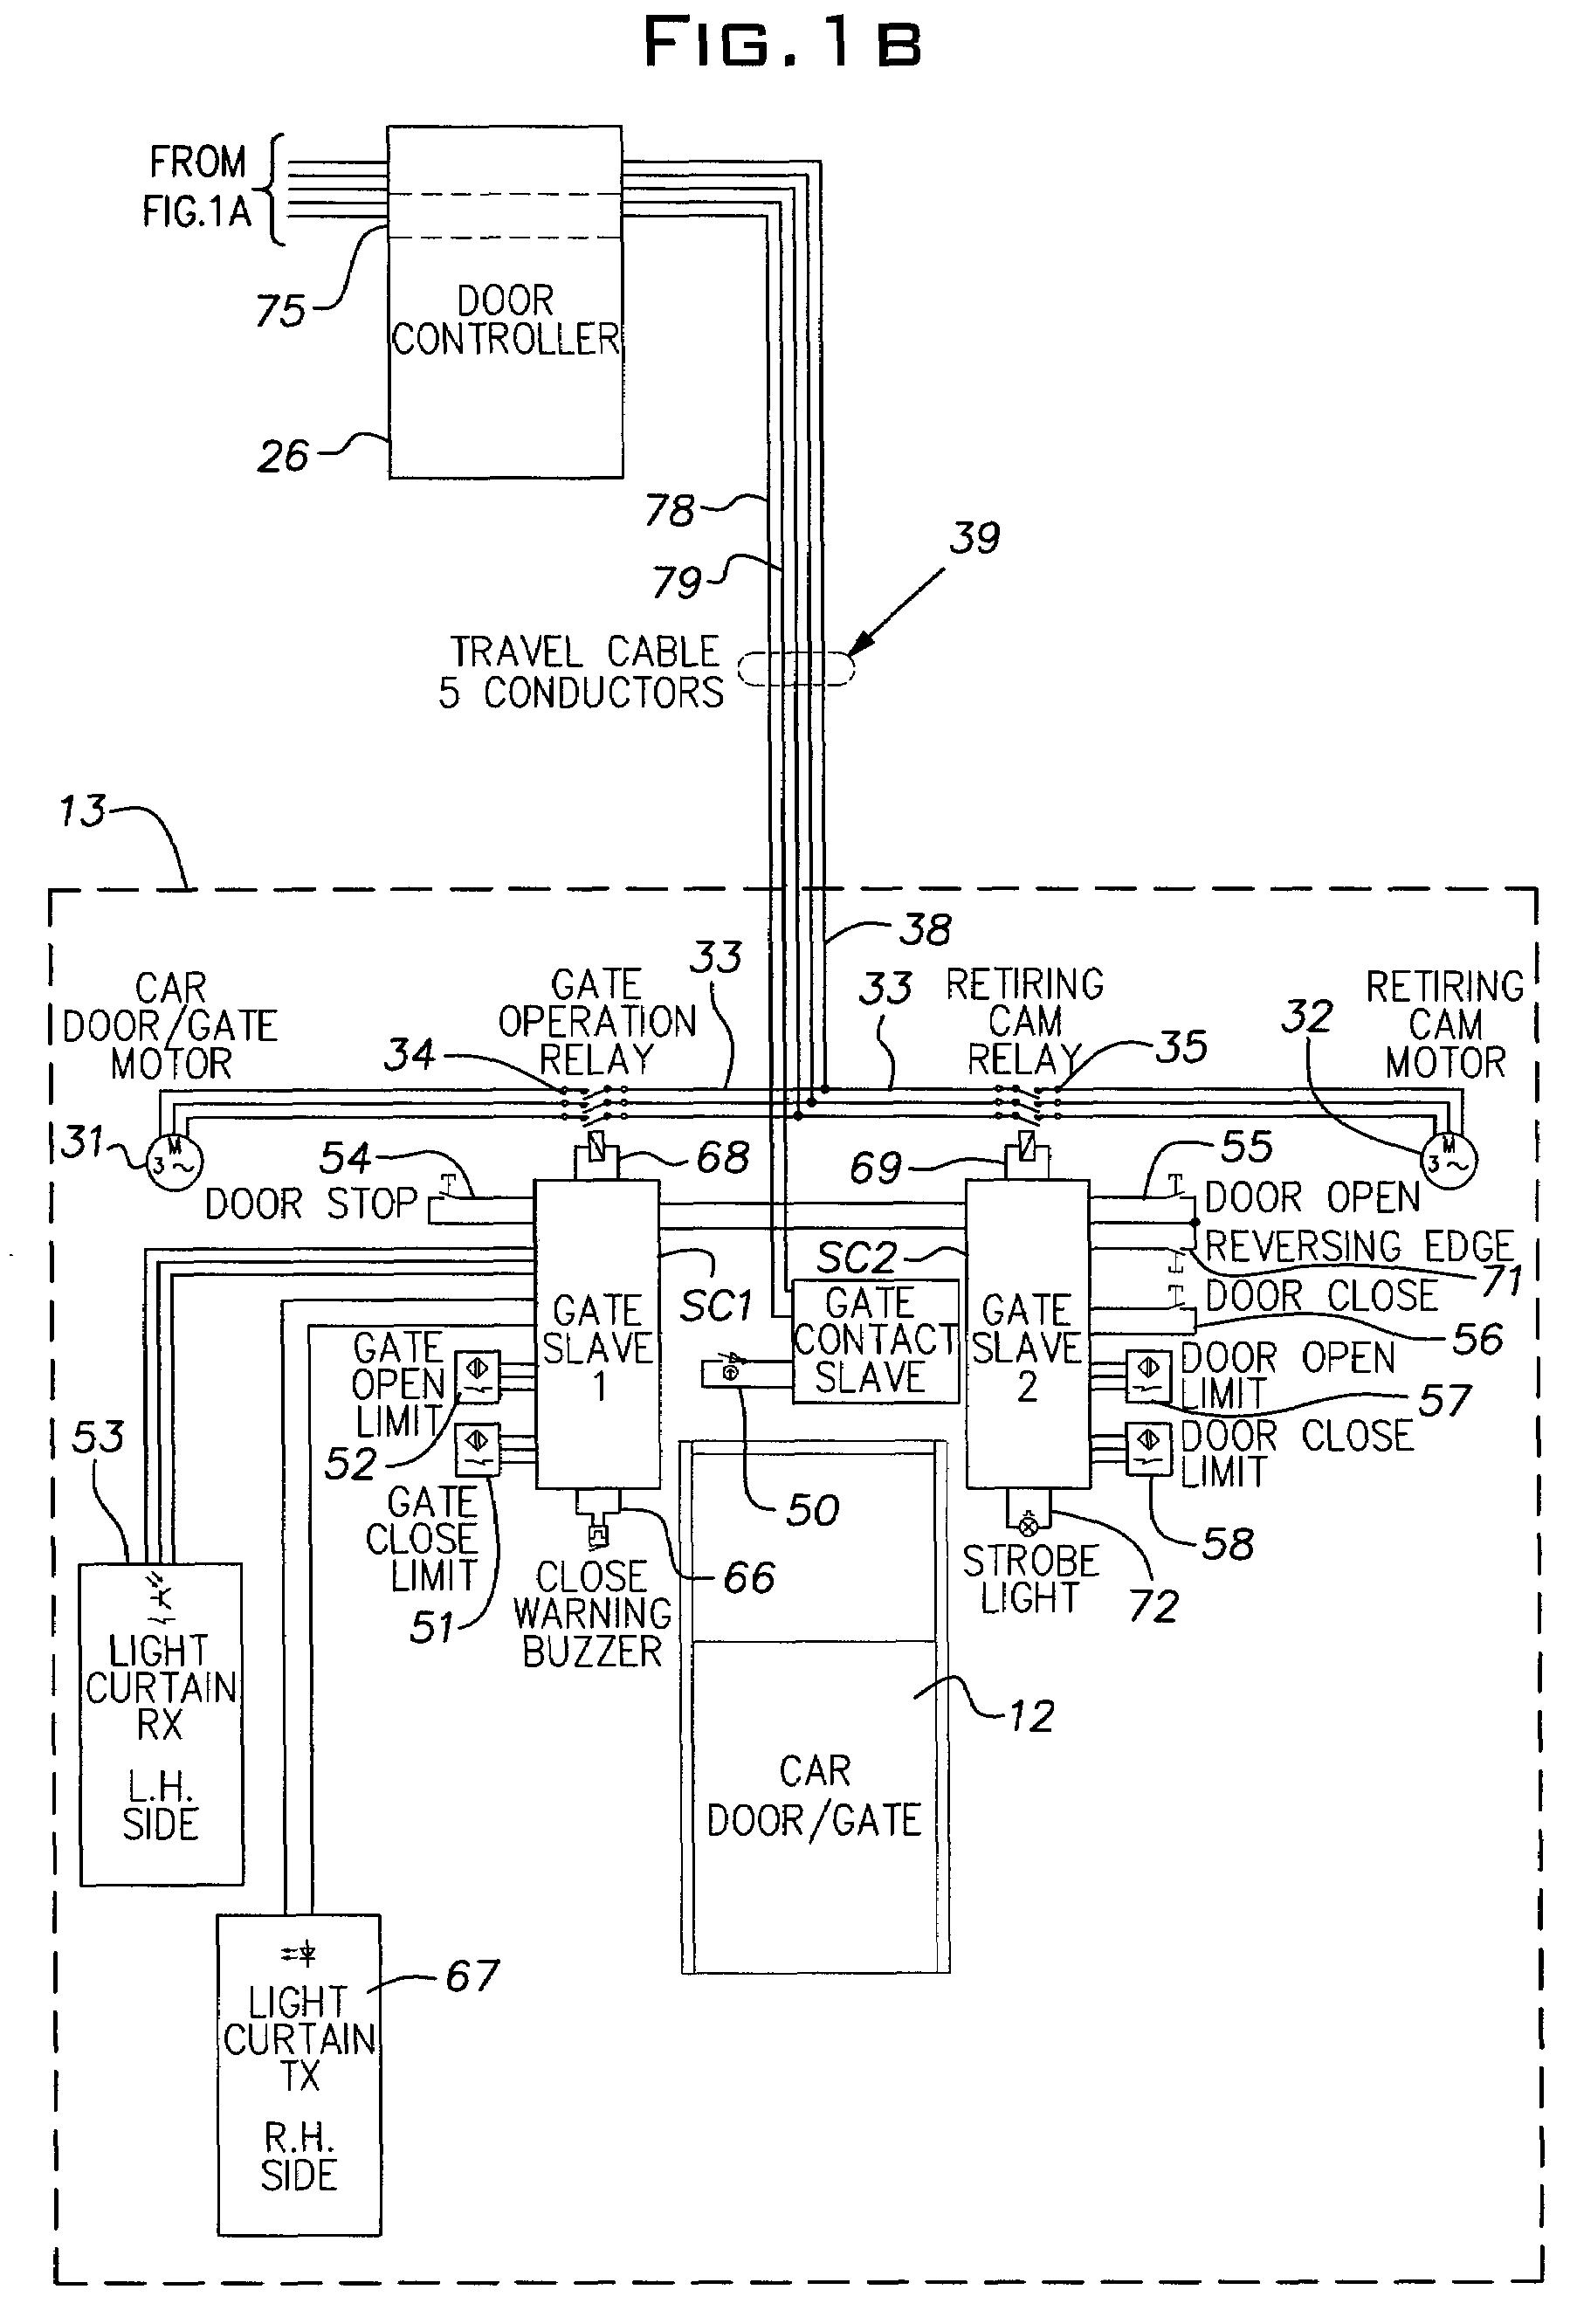 Otis Wiring Diagram 1 1s6880a Auto Electrical 2001 Kawasaki Prairie 300 Schematic Related With